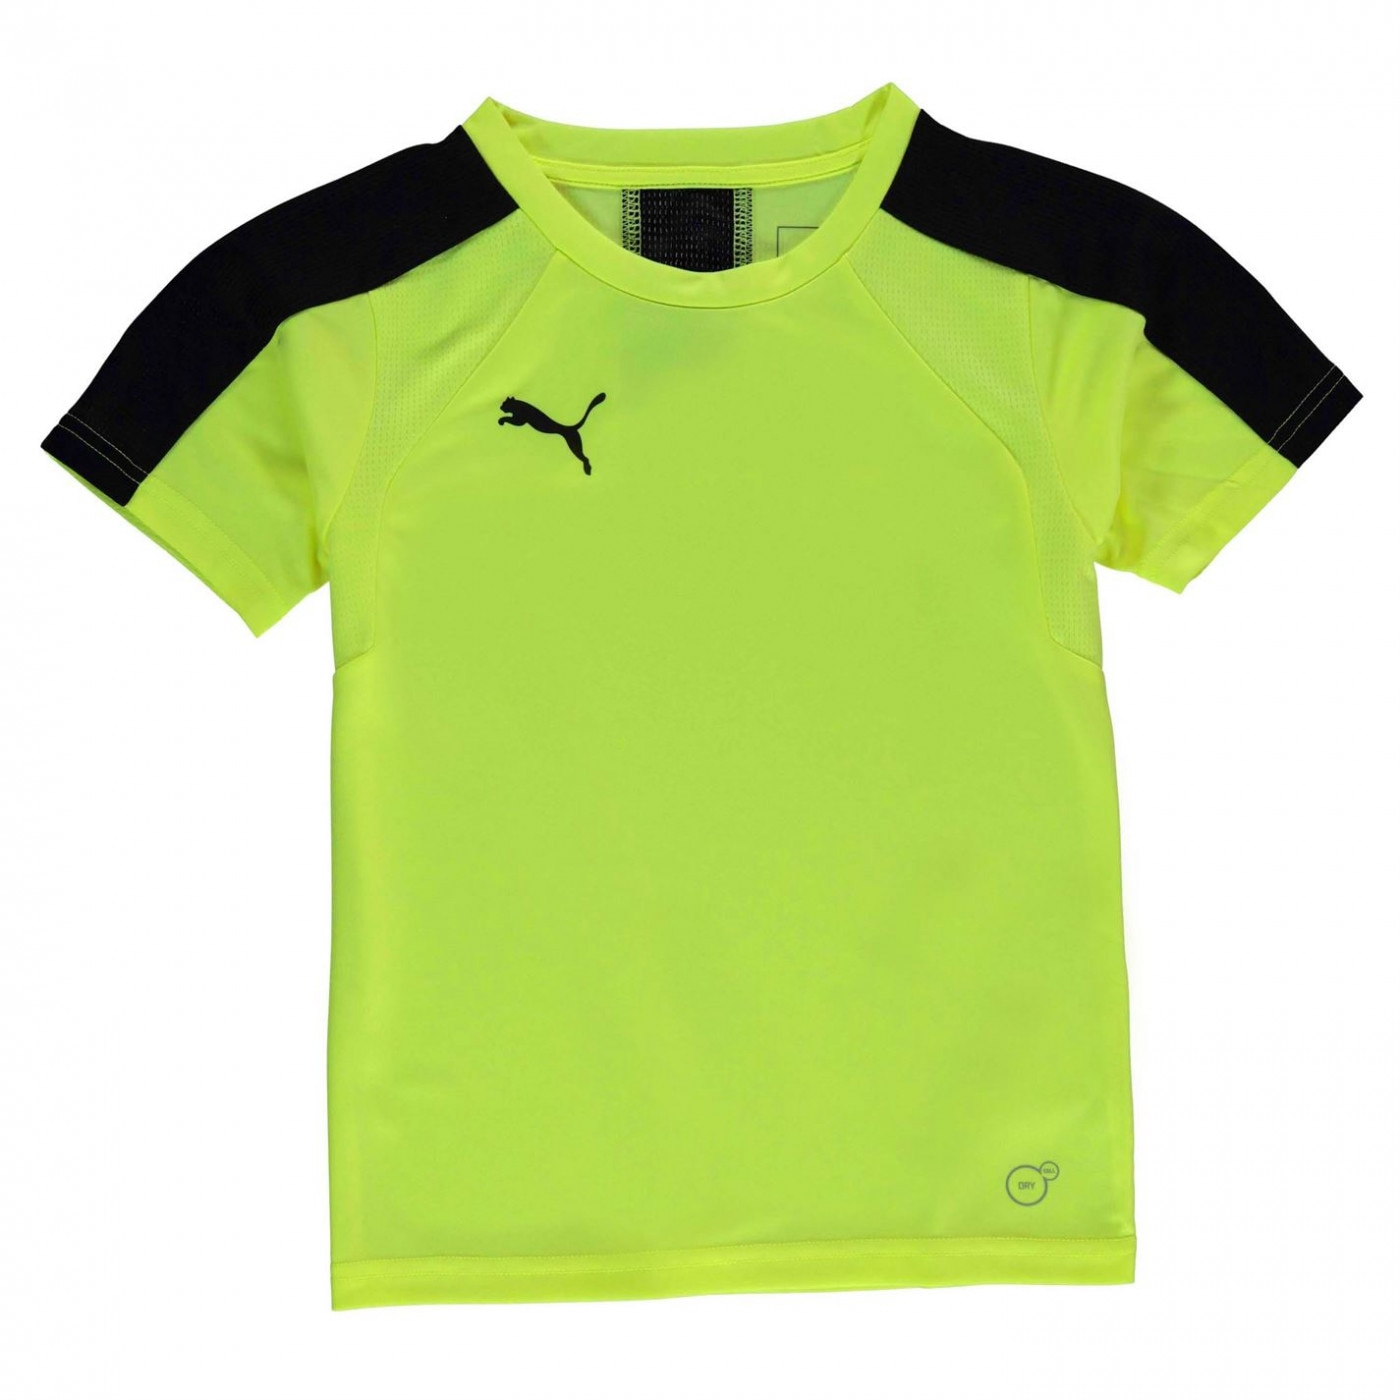 Puma Evo Training T Shirt Junior Boys